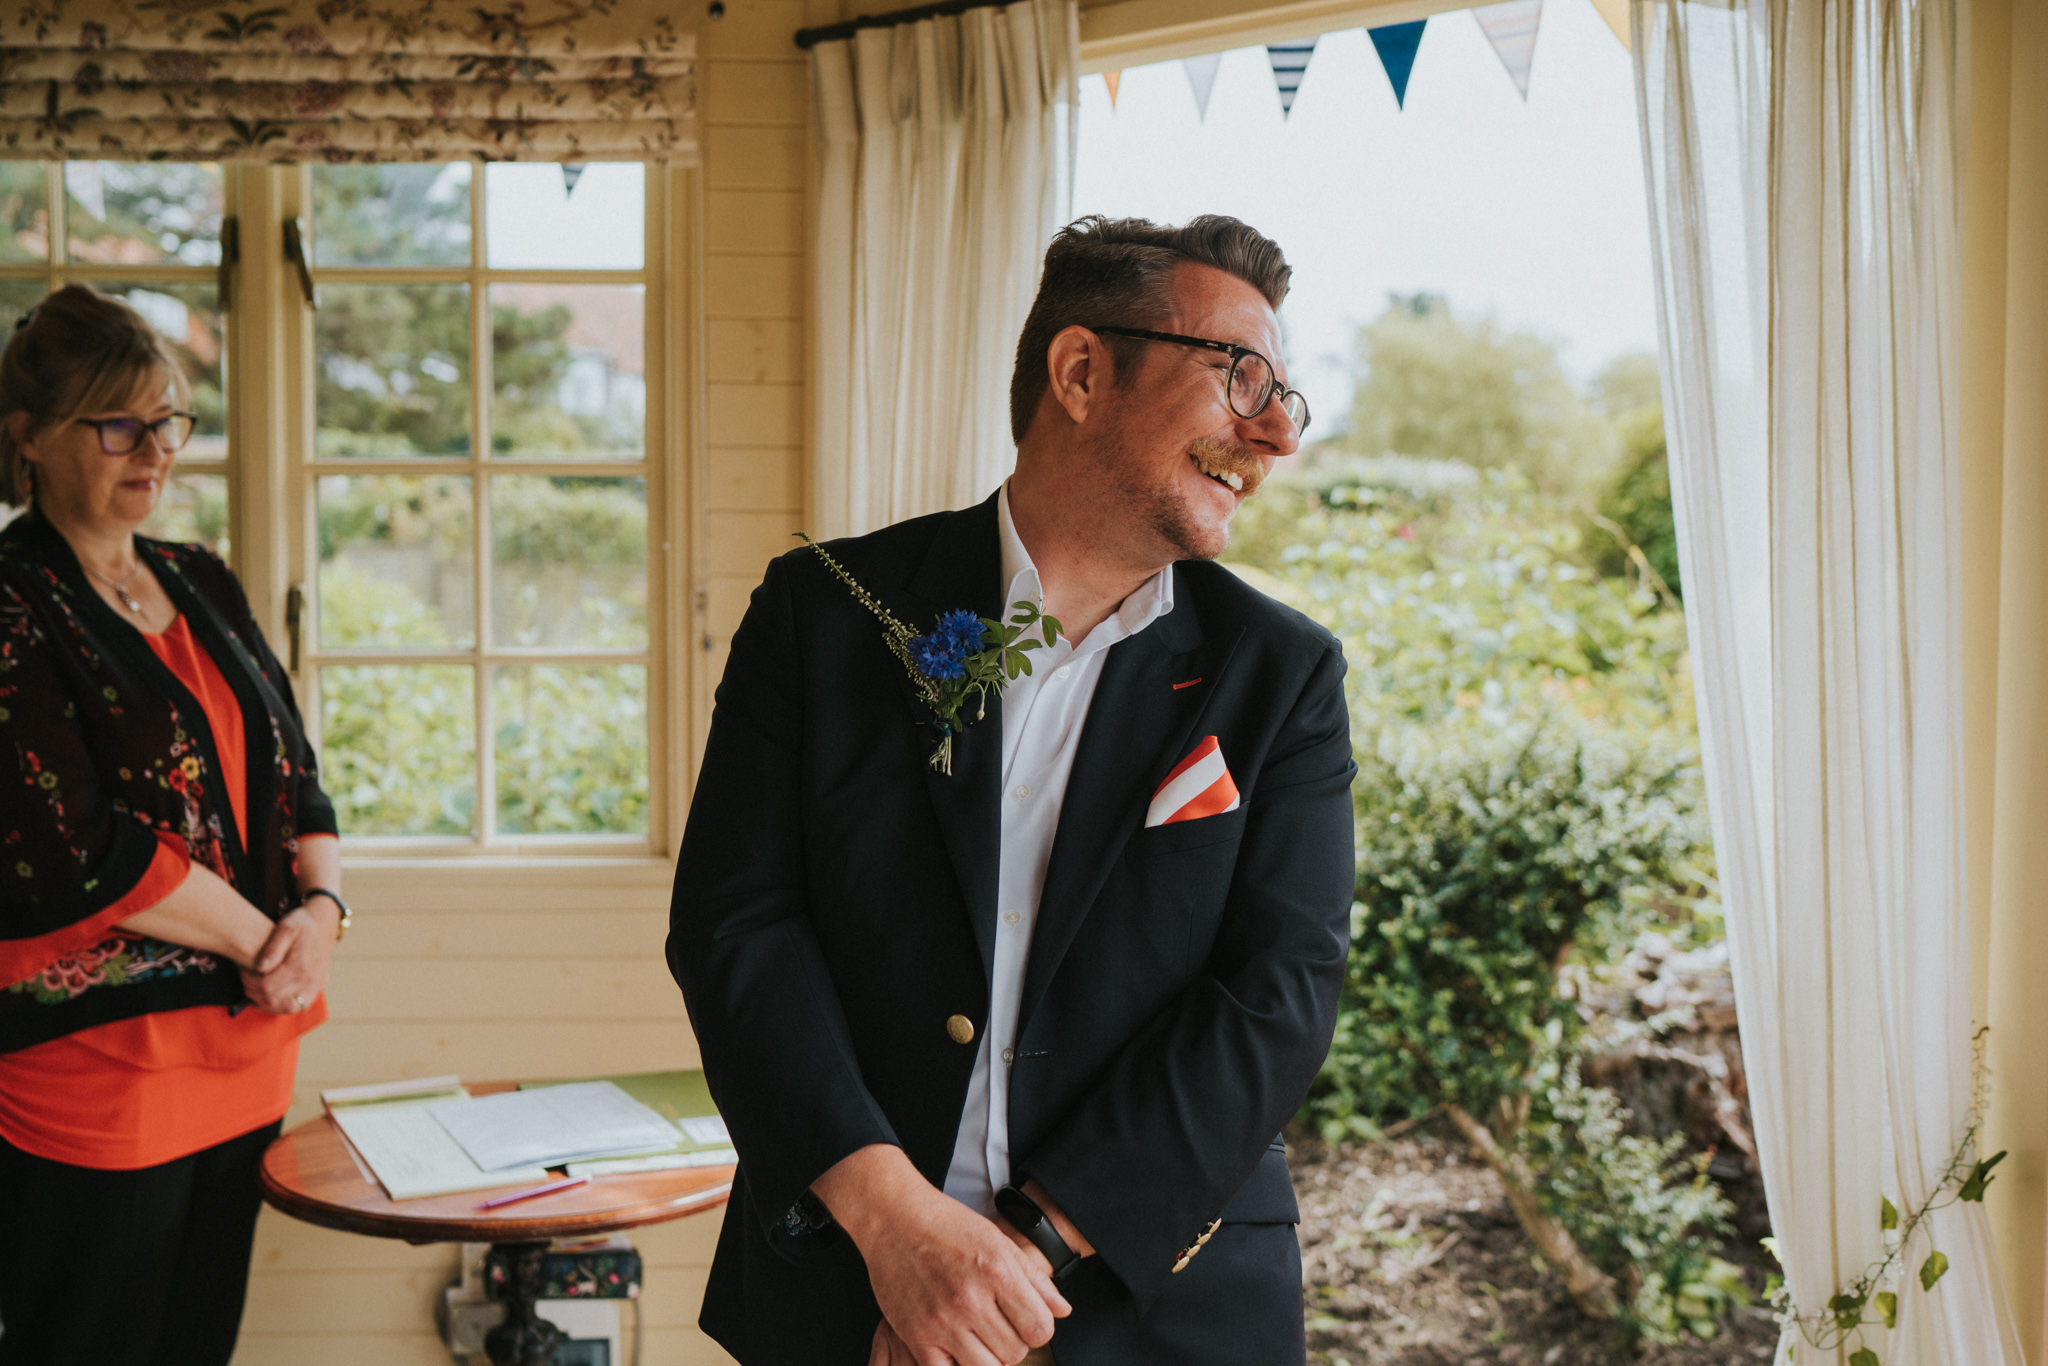 hannah-anthony-thorpeness-retro-diy-50s-wedding-grace-elizabeth-colchester-essex-alternative-wedding-lifestyle-photographer-essex-suffolk-norfolk-devon (10 of 39).jpg